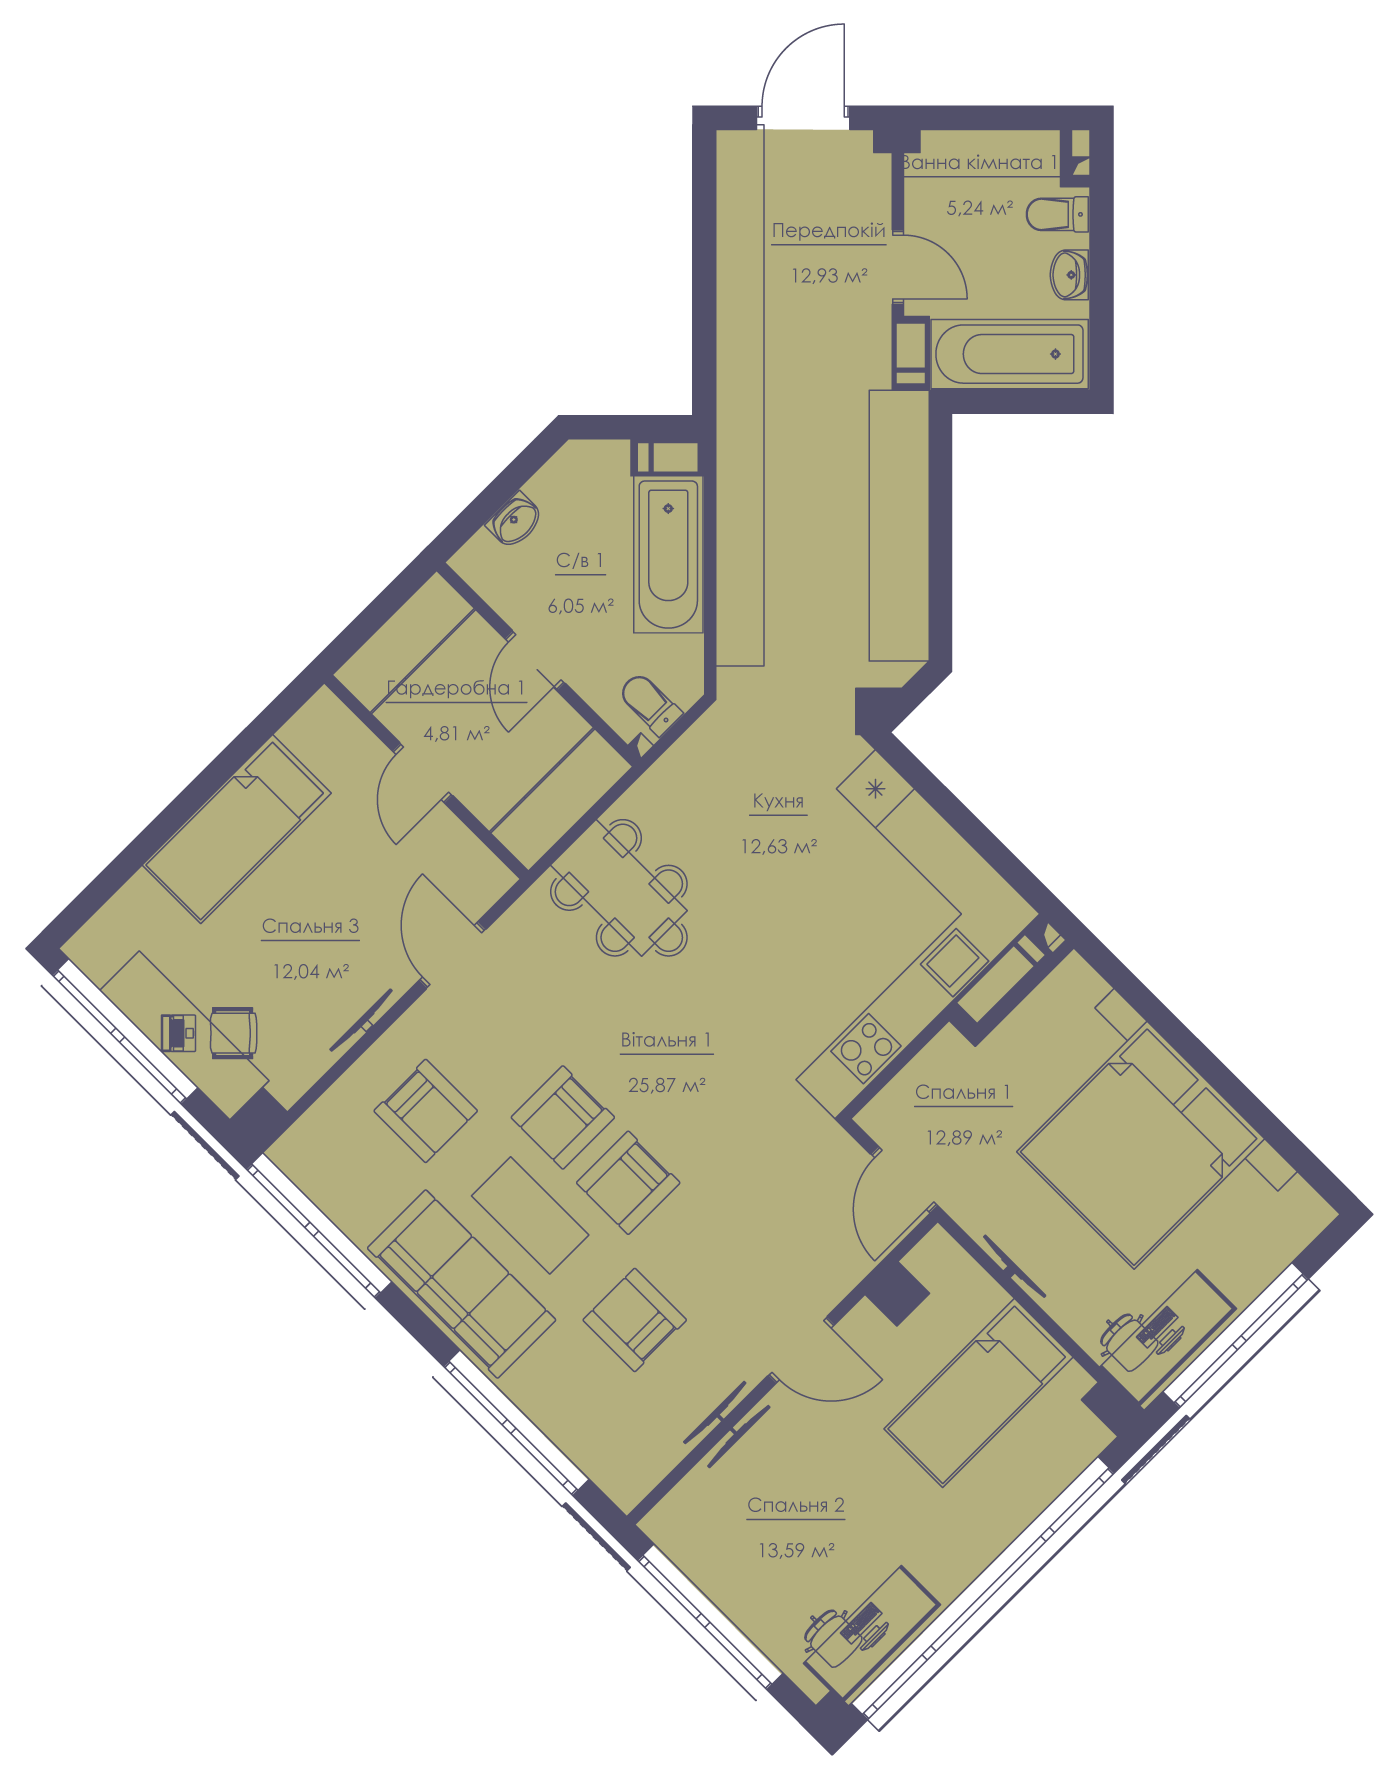 Apartment layout KV_59_4a_1_1_2-1